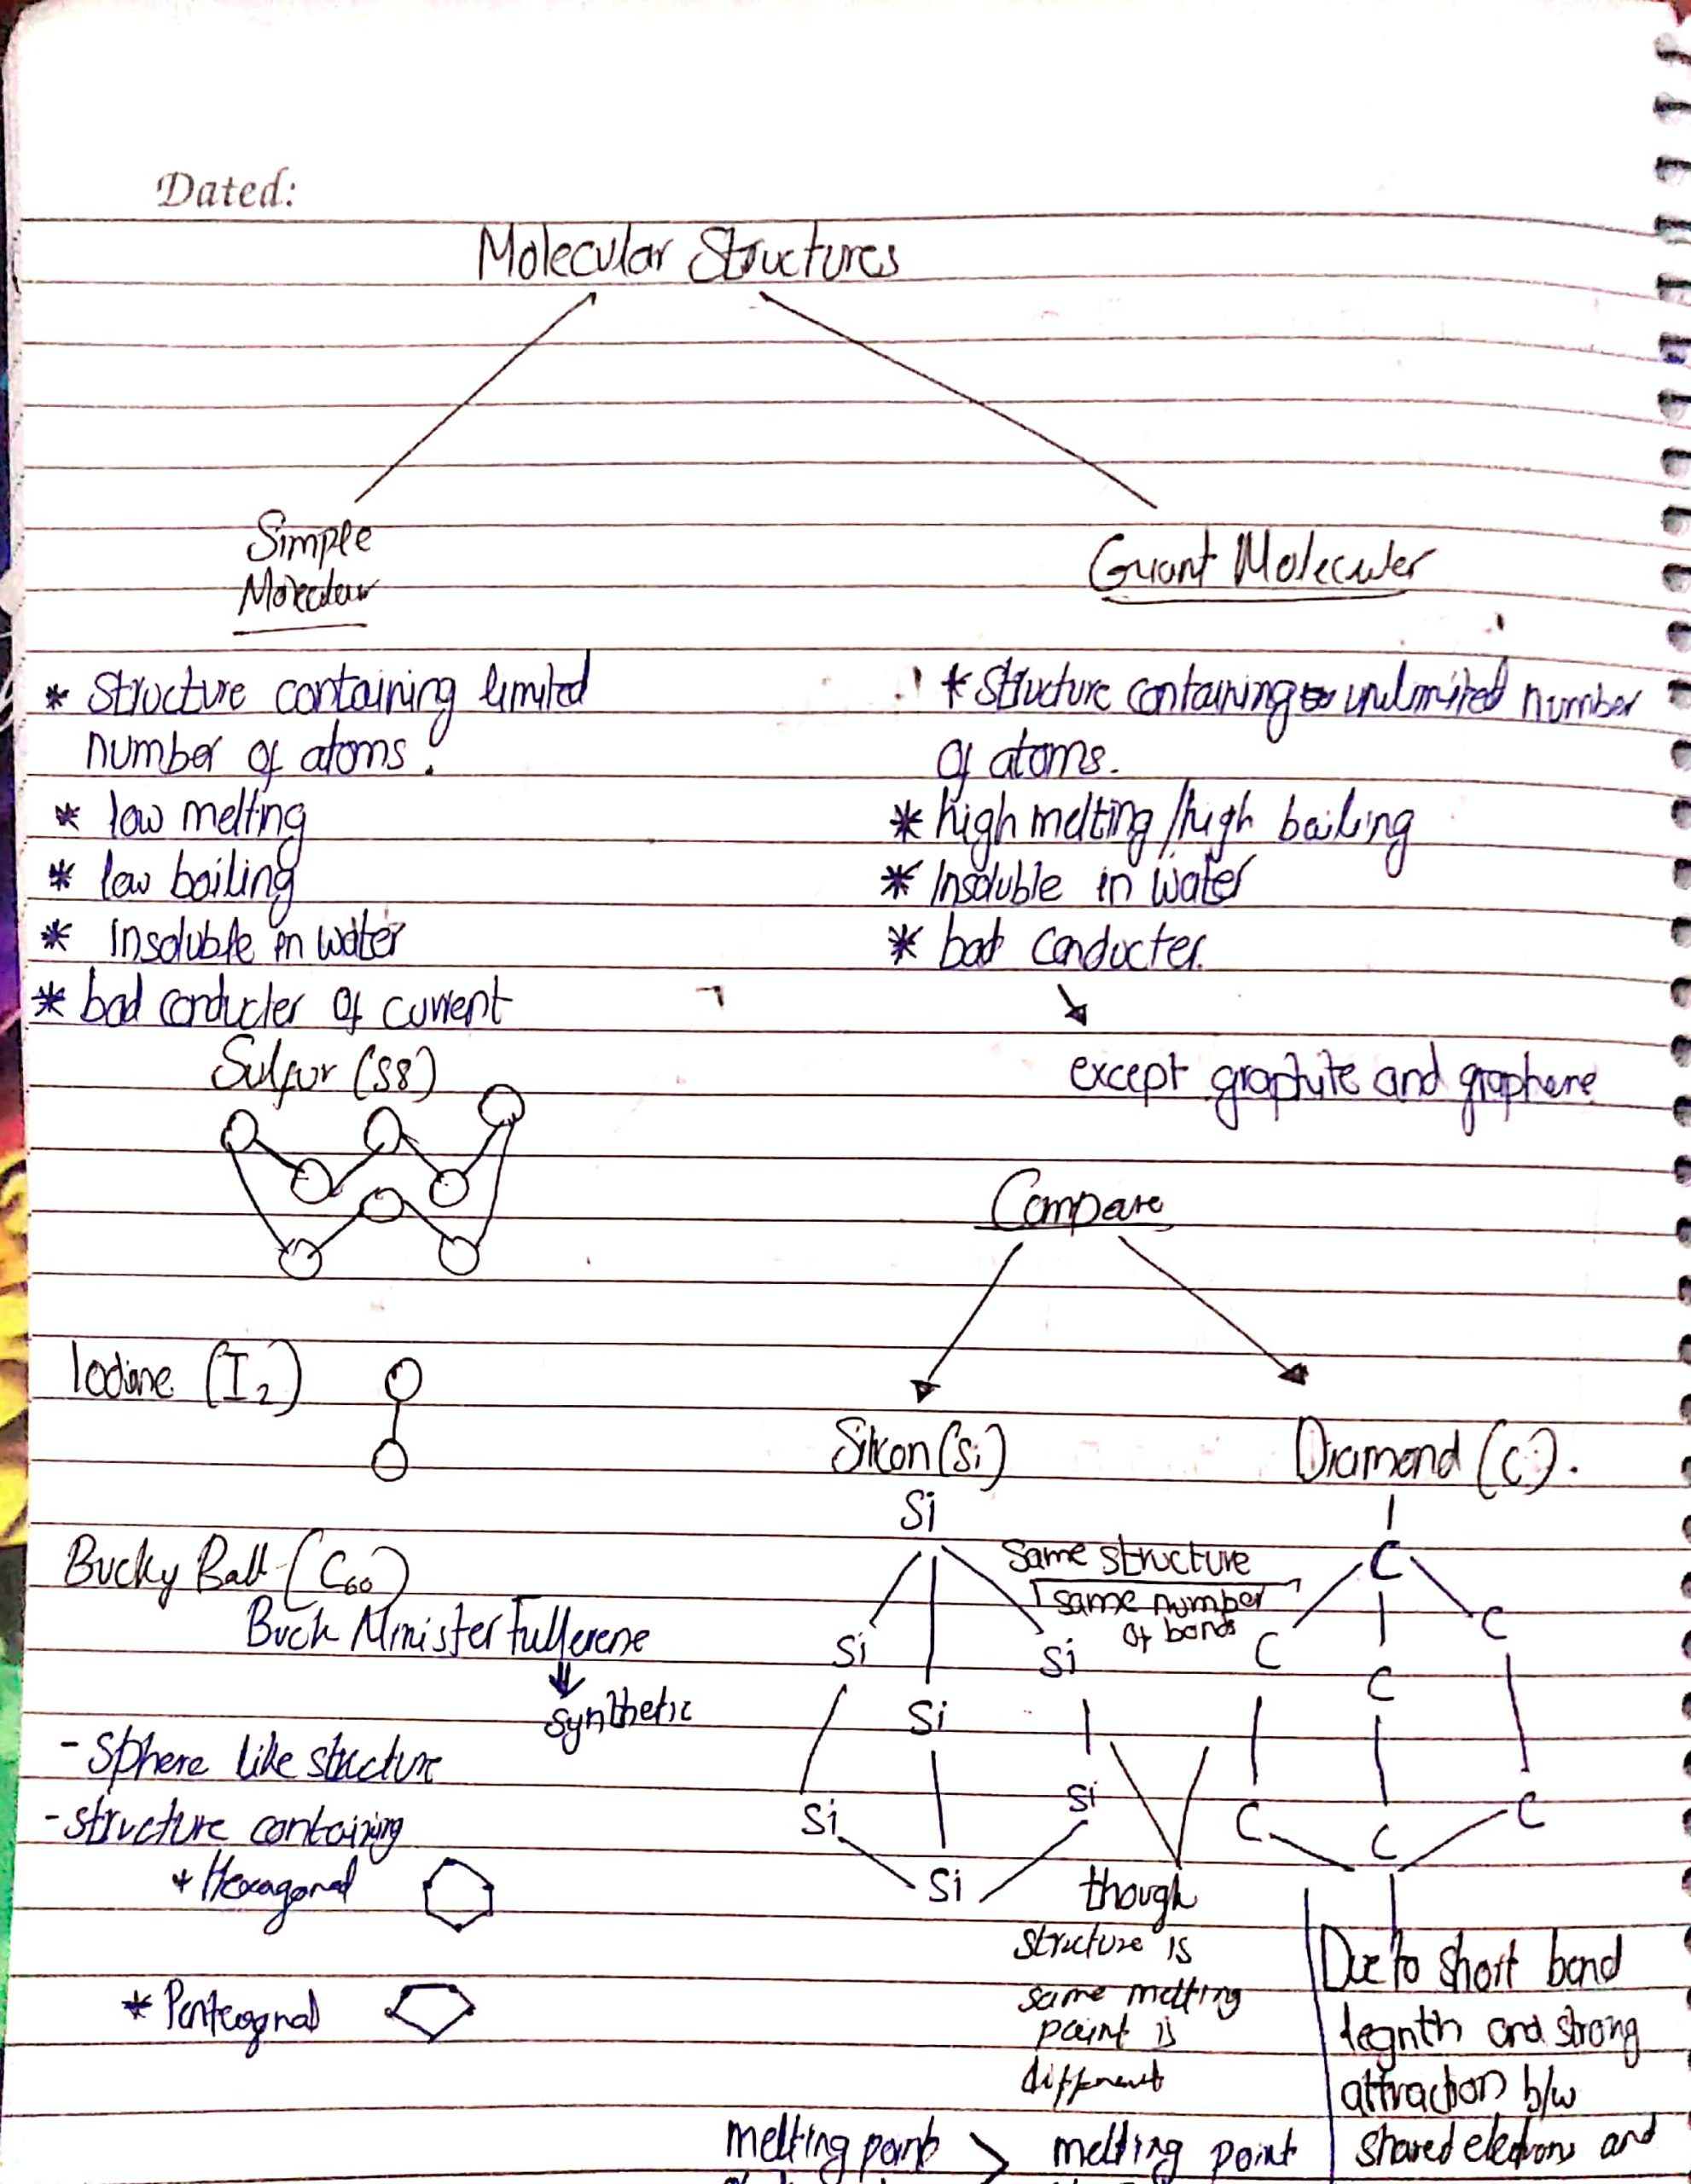 chemical bonding Sir Kashif_31